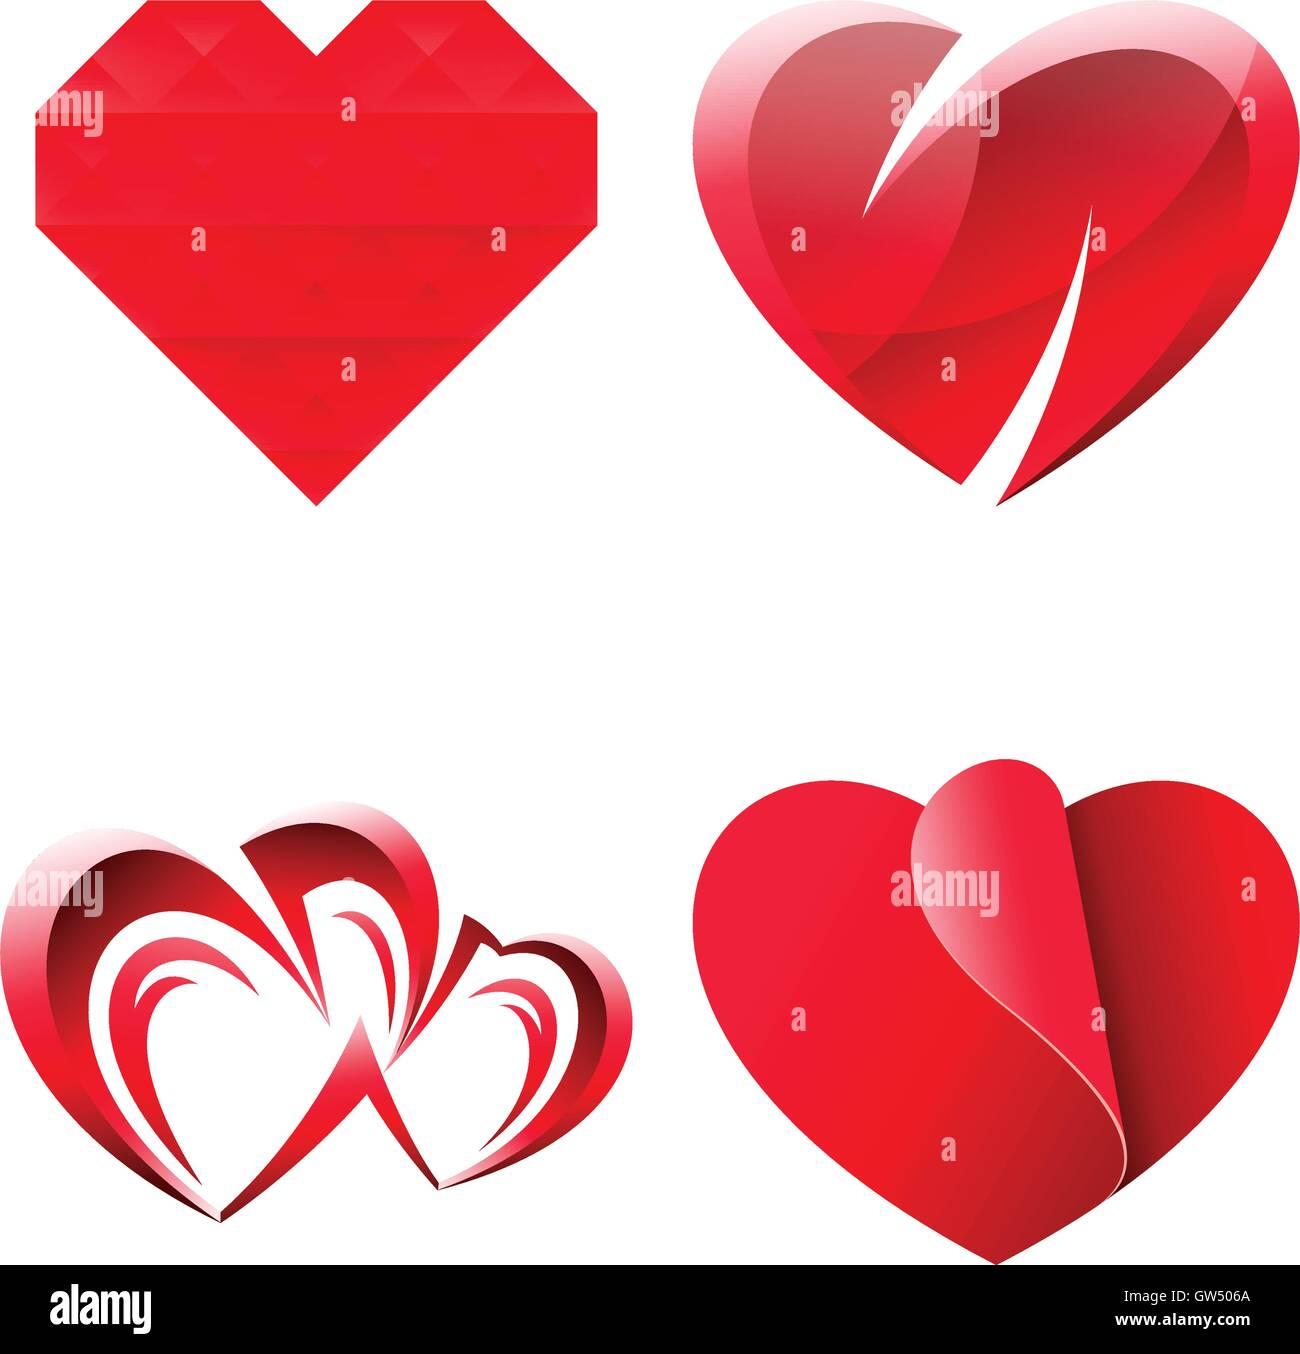 Vector icon design miscellaneous sweet romantic heart symbols set miscellaneous sweet romantic heart symbols set buycottarizona Gallery